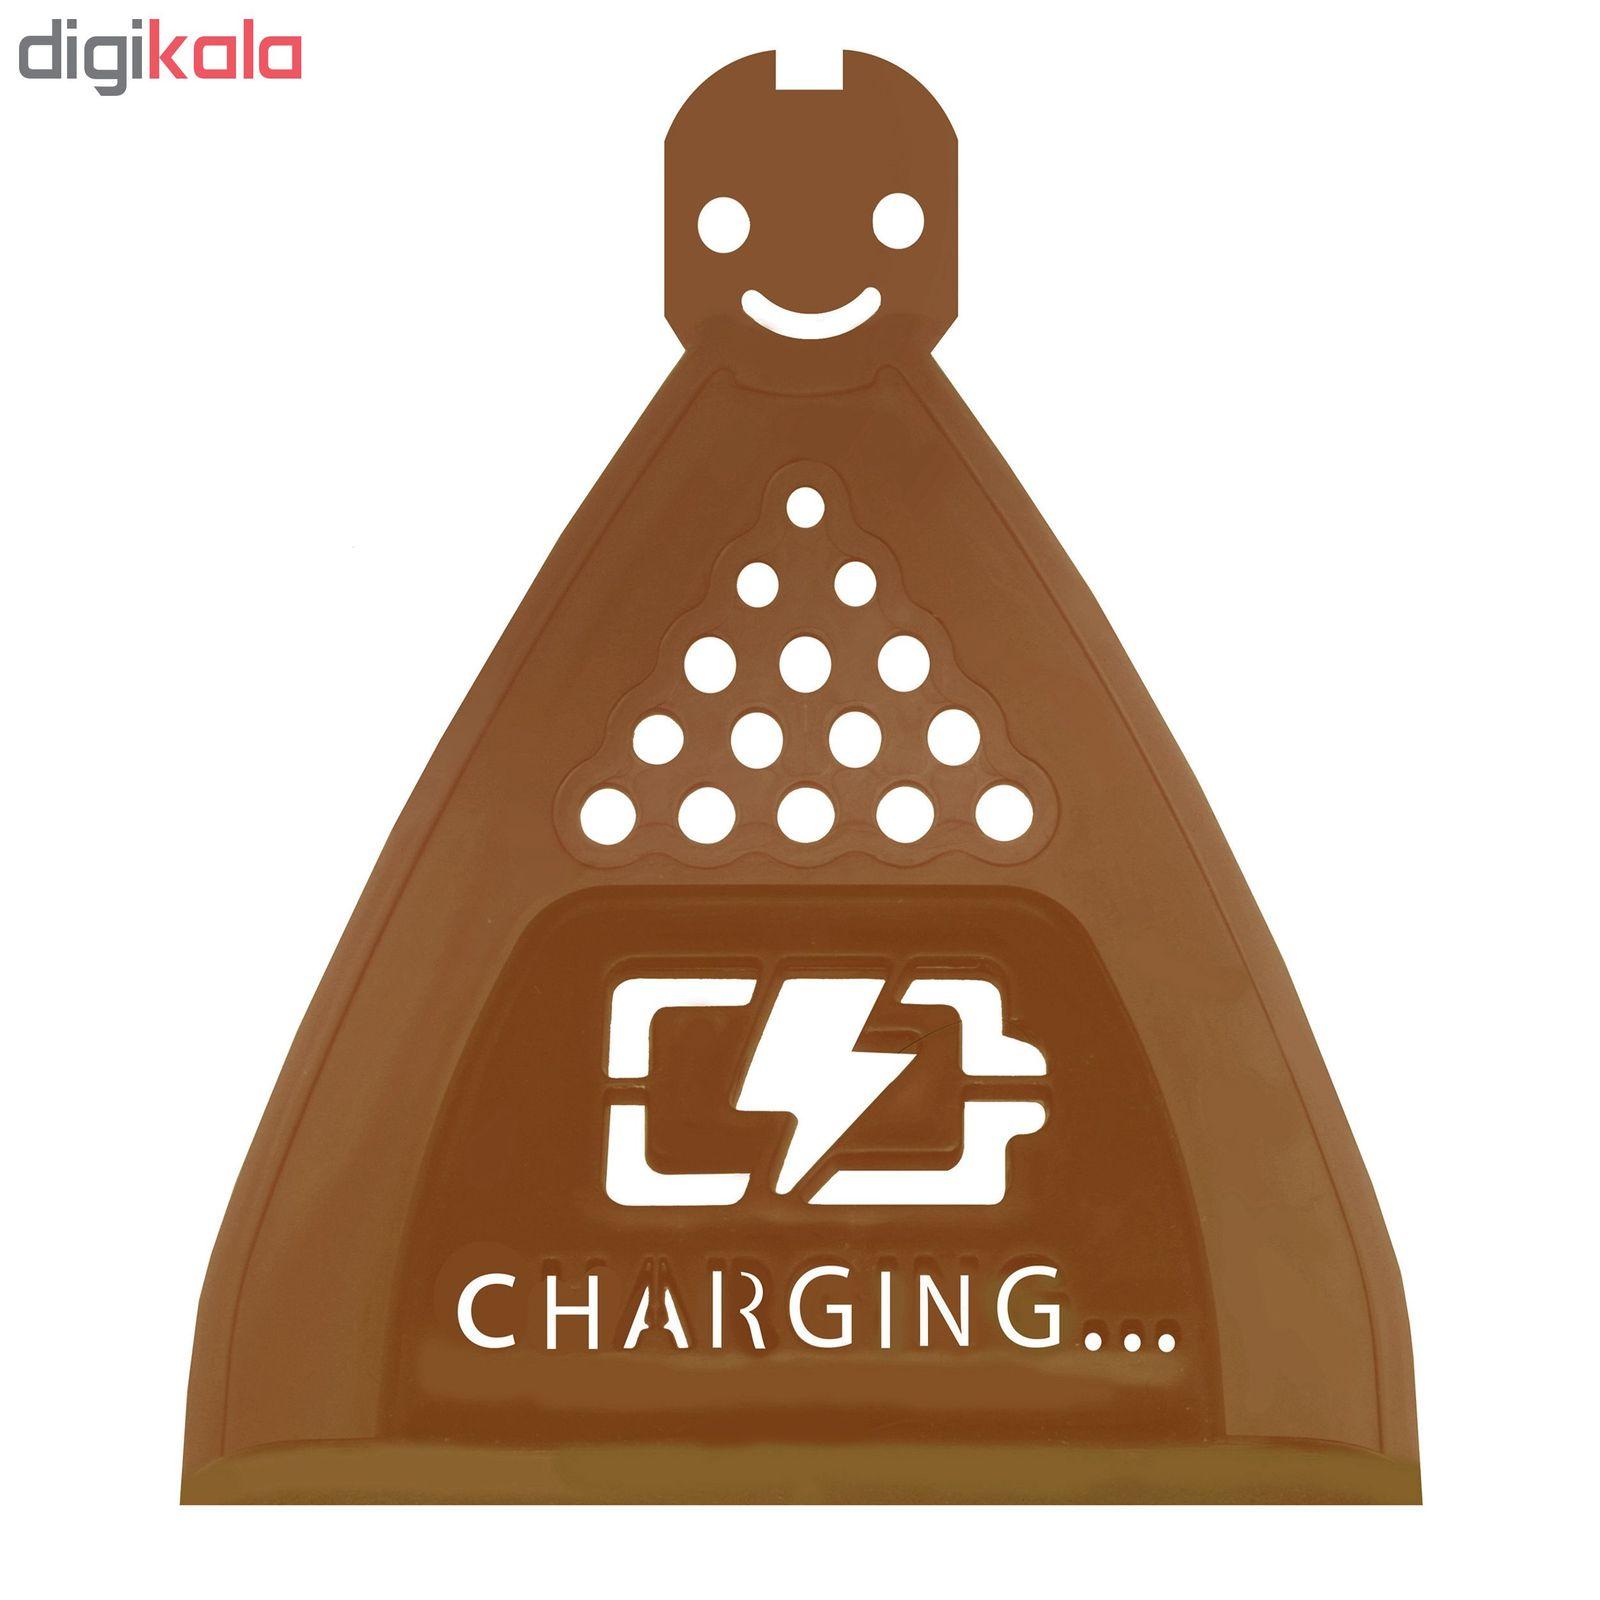 پایه نگهدارنده شارژر موبایل مدل Hng 0229 main 1 3